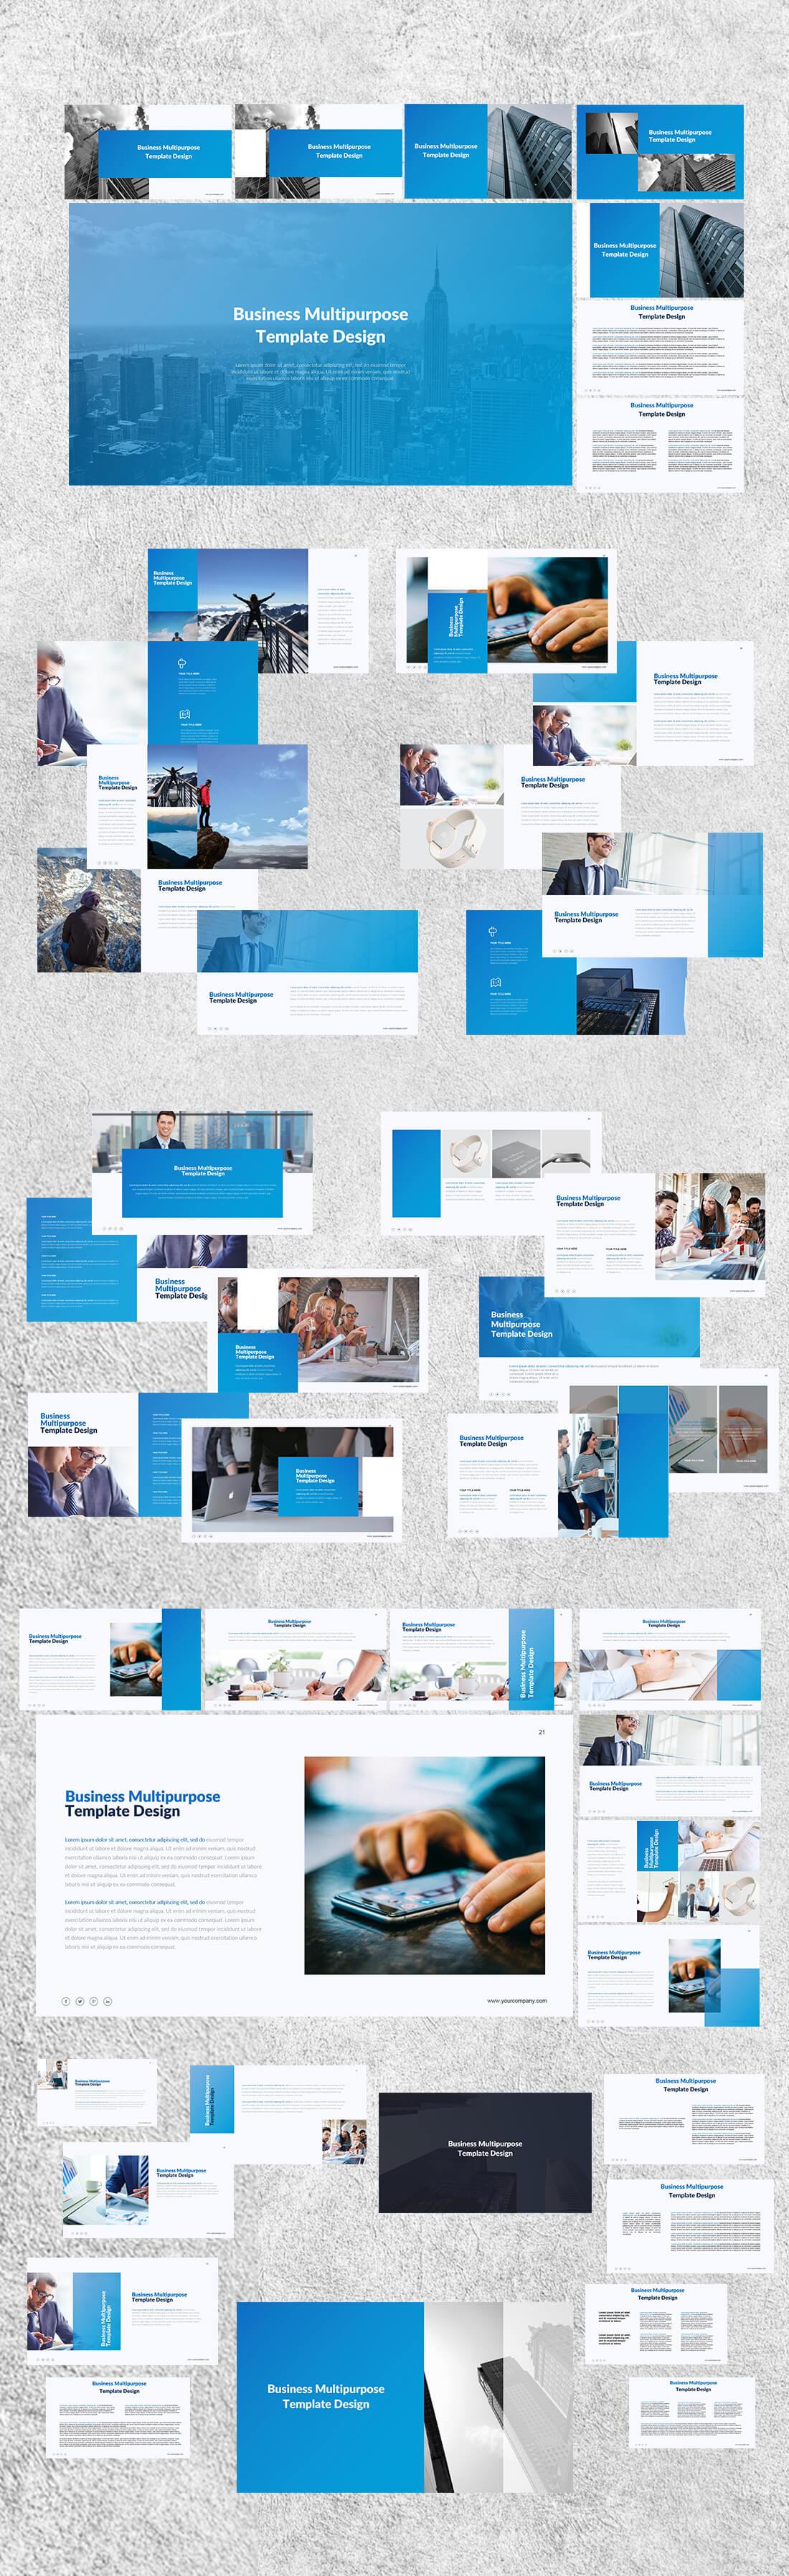 4500 Stunning Powerpoint Presentation Slides - only $9